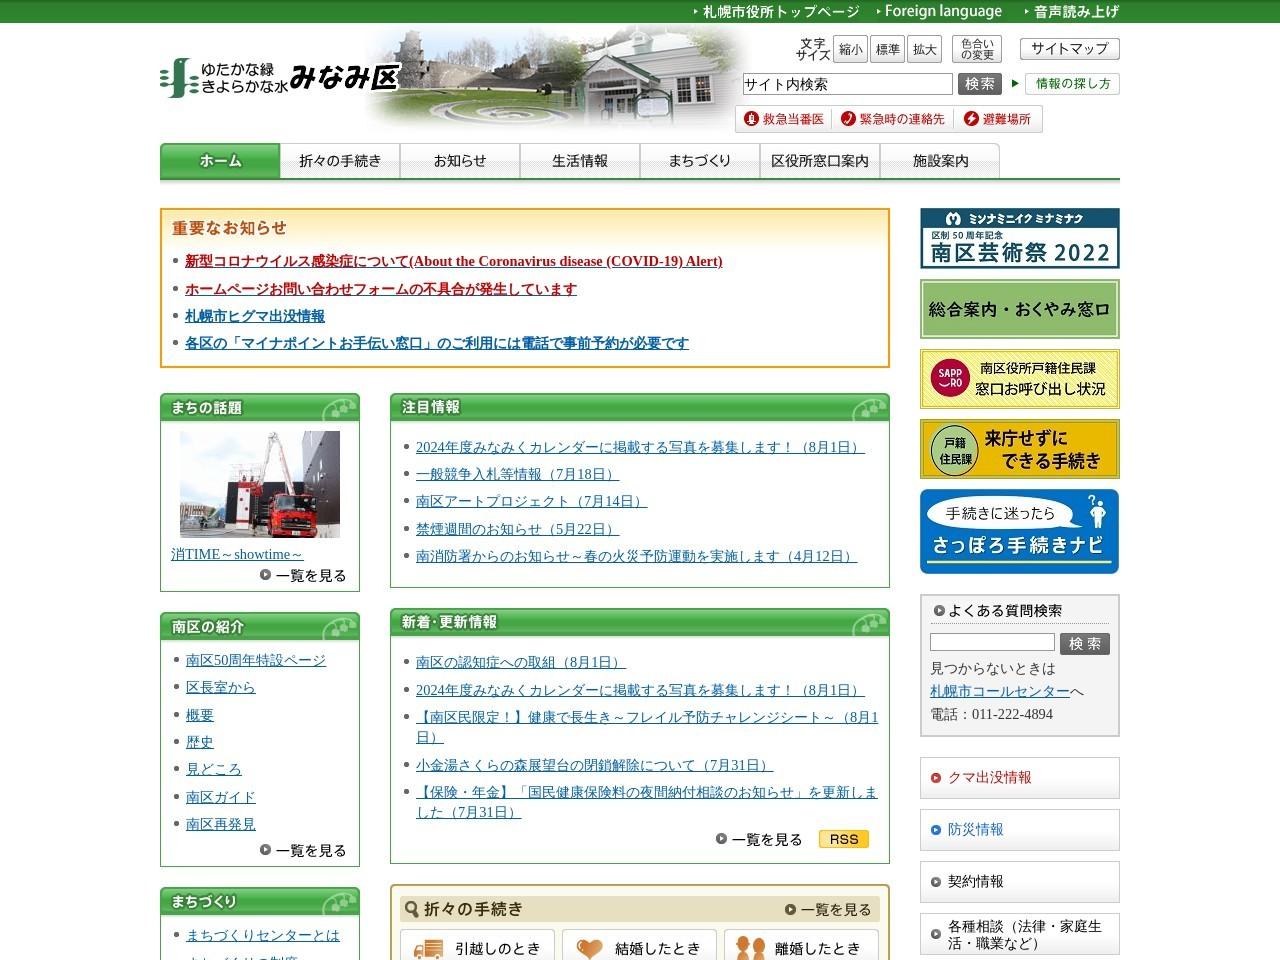 http://www.city.sapporo.jp/minami/